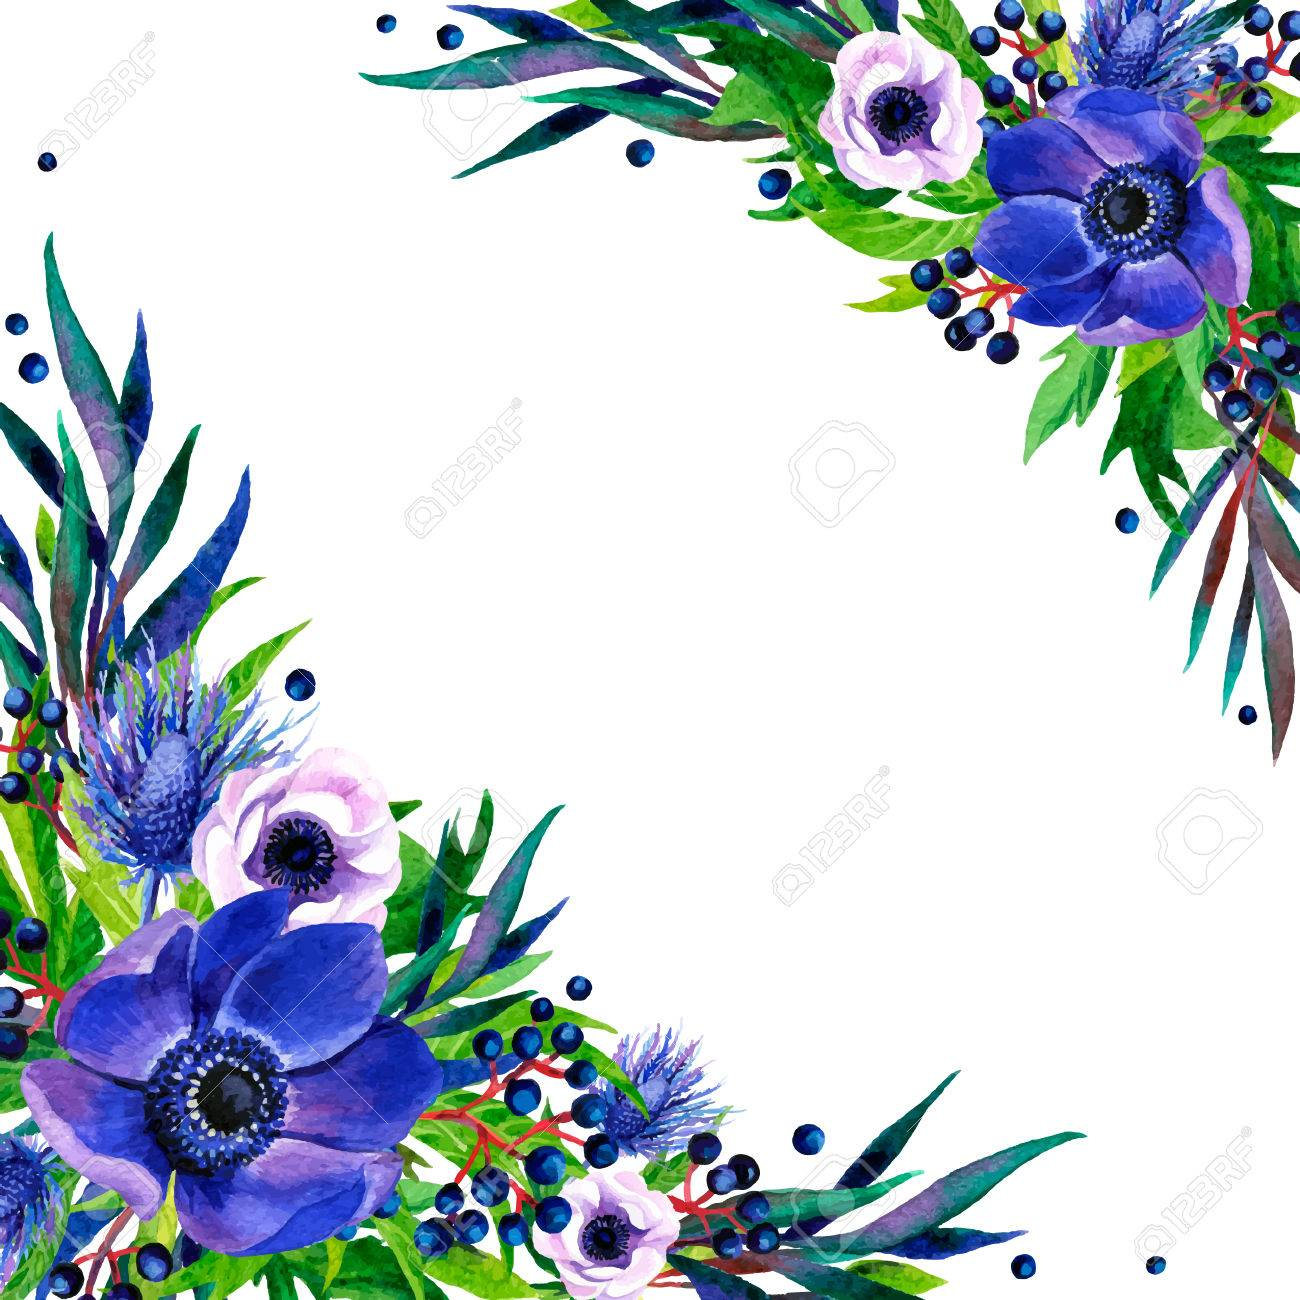 Uva, Flor imagen png - imagen transparente descarga gratuita